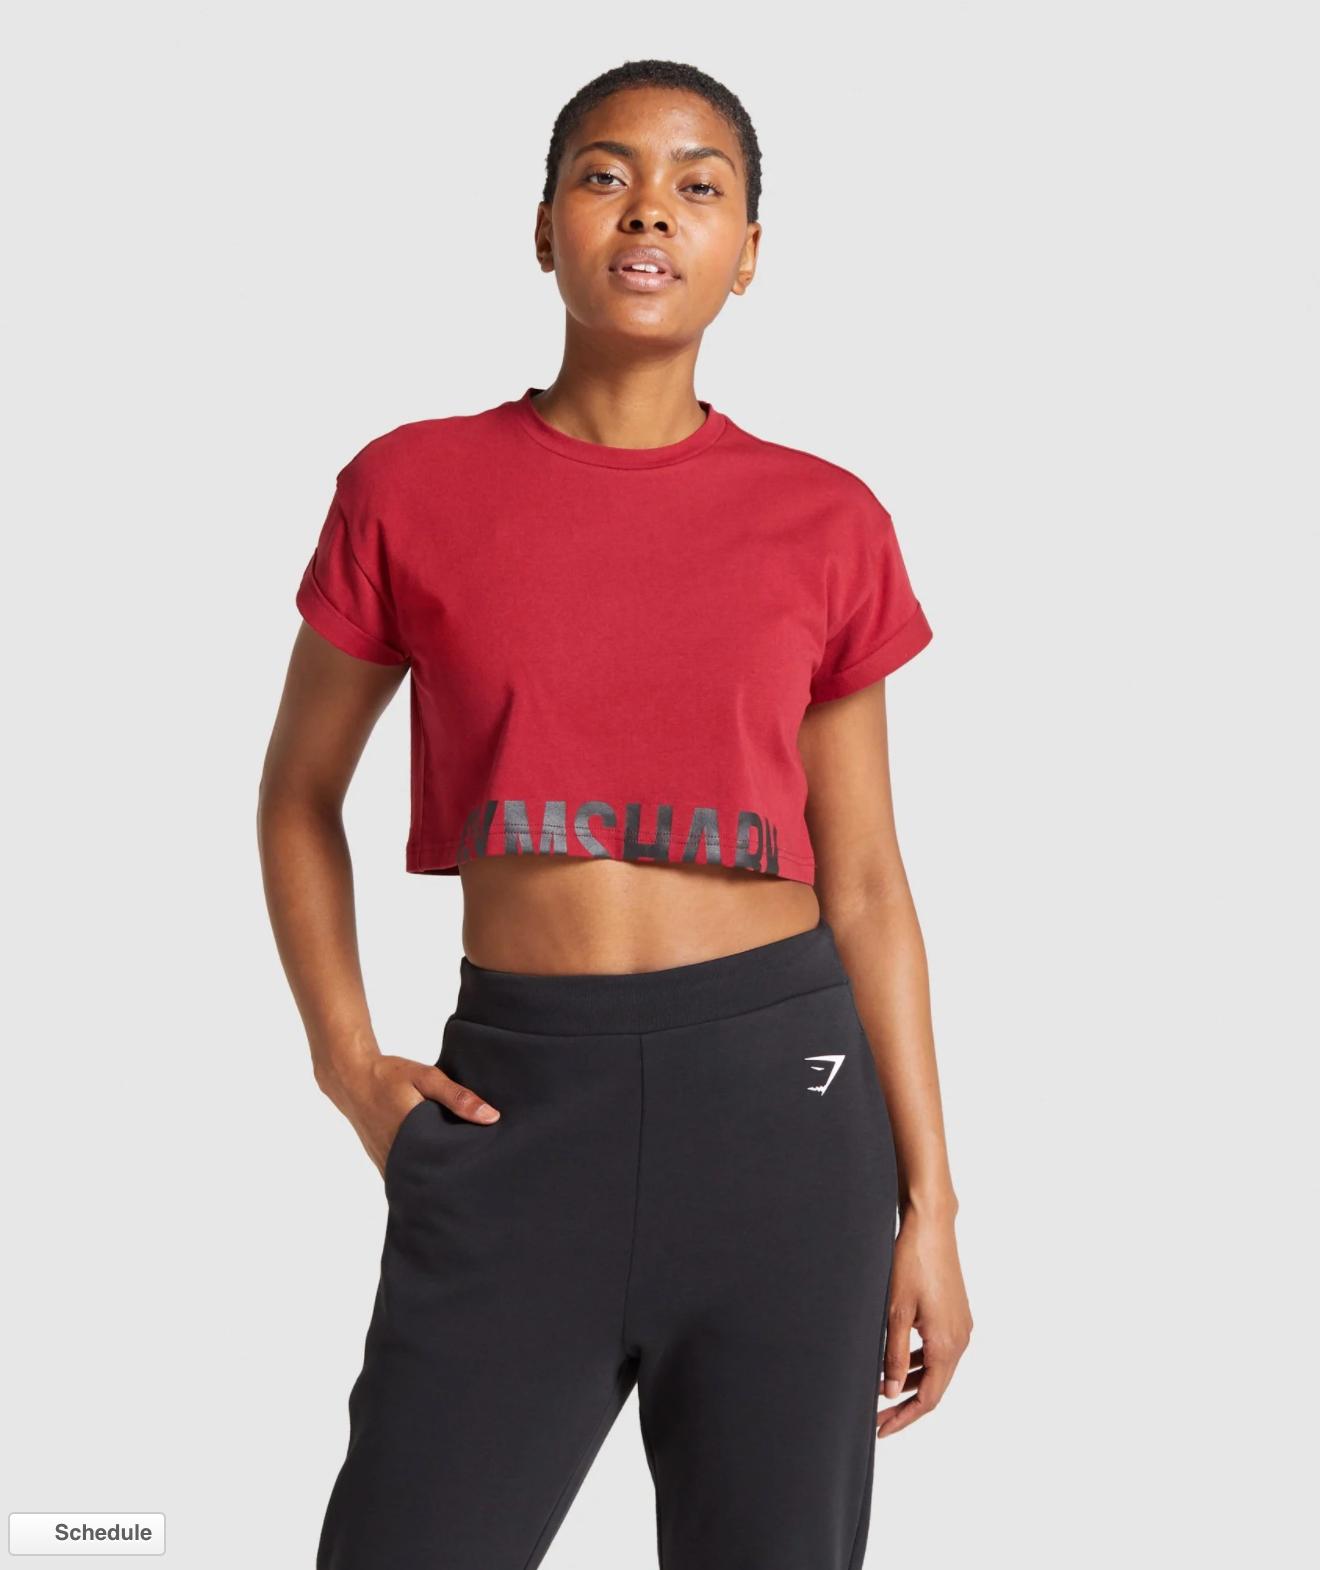 Gymshark Fraction Crop Top in burgundy red